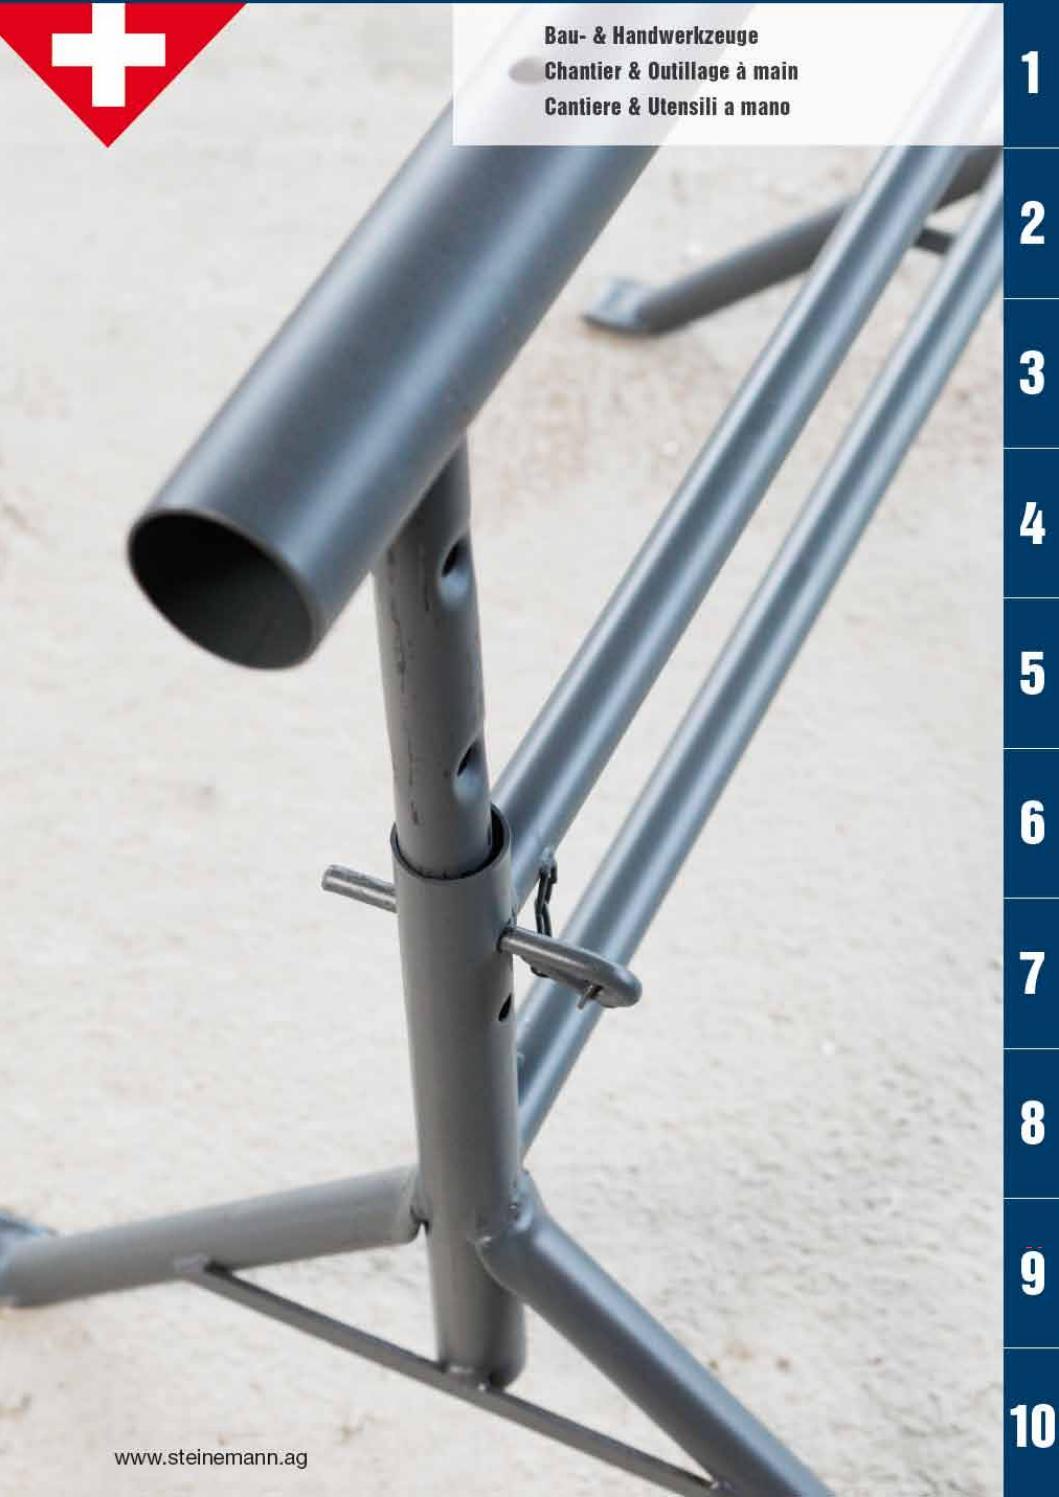 FERRO TONDO Acciaio Rotondo Materiale Rotondo diametro Ø 70 mm 300mm lungo